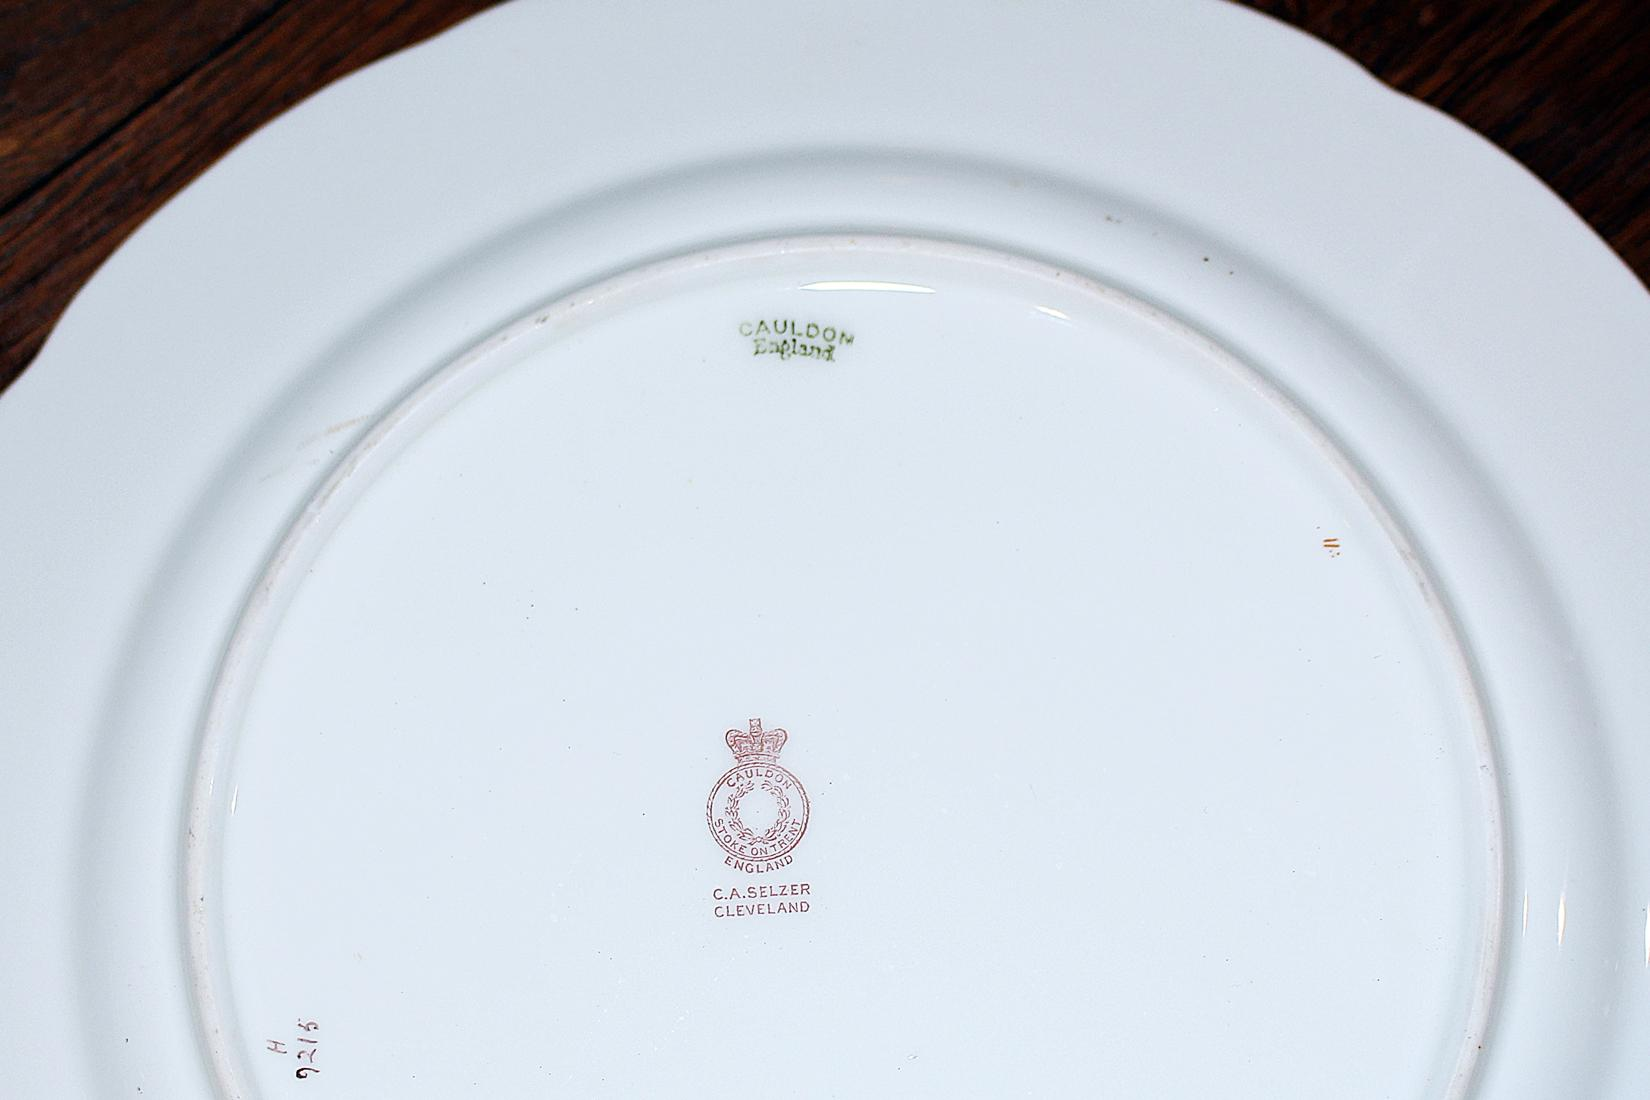 Cauldon Fine Bone-China PLates Set of 12 - Image 7 of 8  sc 1 st  Chairish & Cauldon Fine Bone-China PLates Set of 12 | Chairish